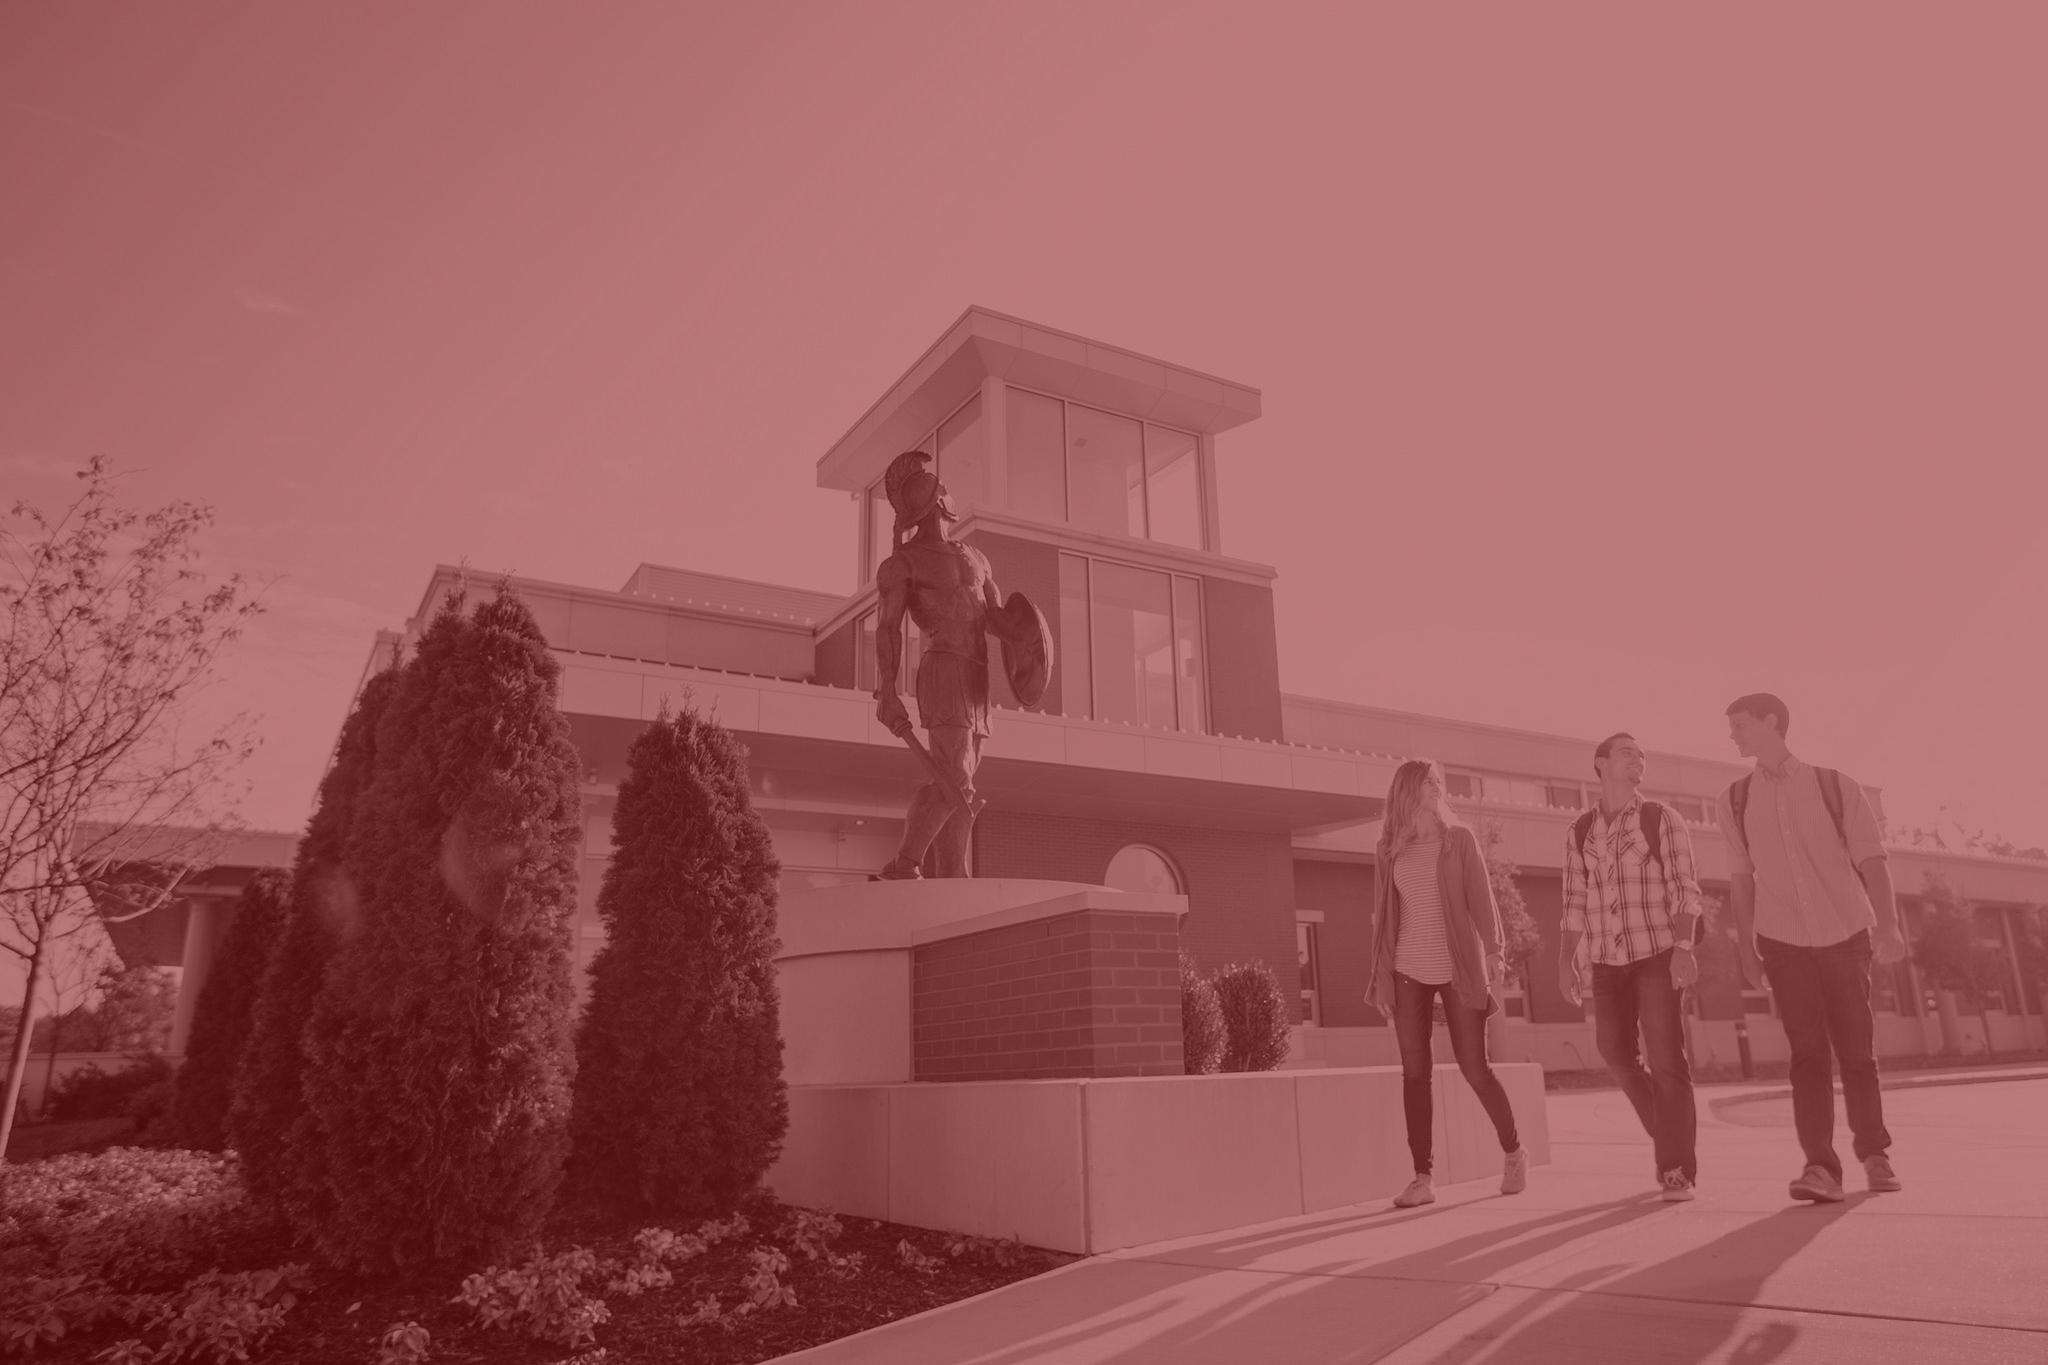 Students walking past MBU's bronze Spartan statue